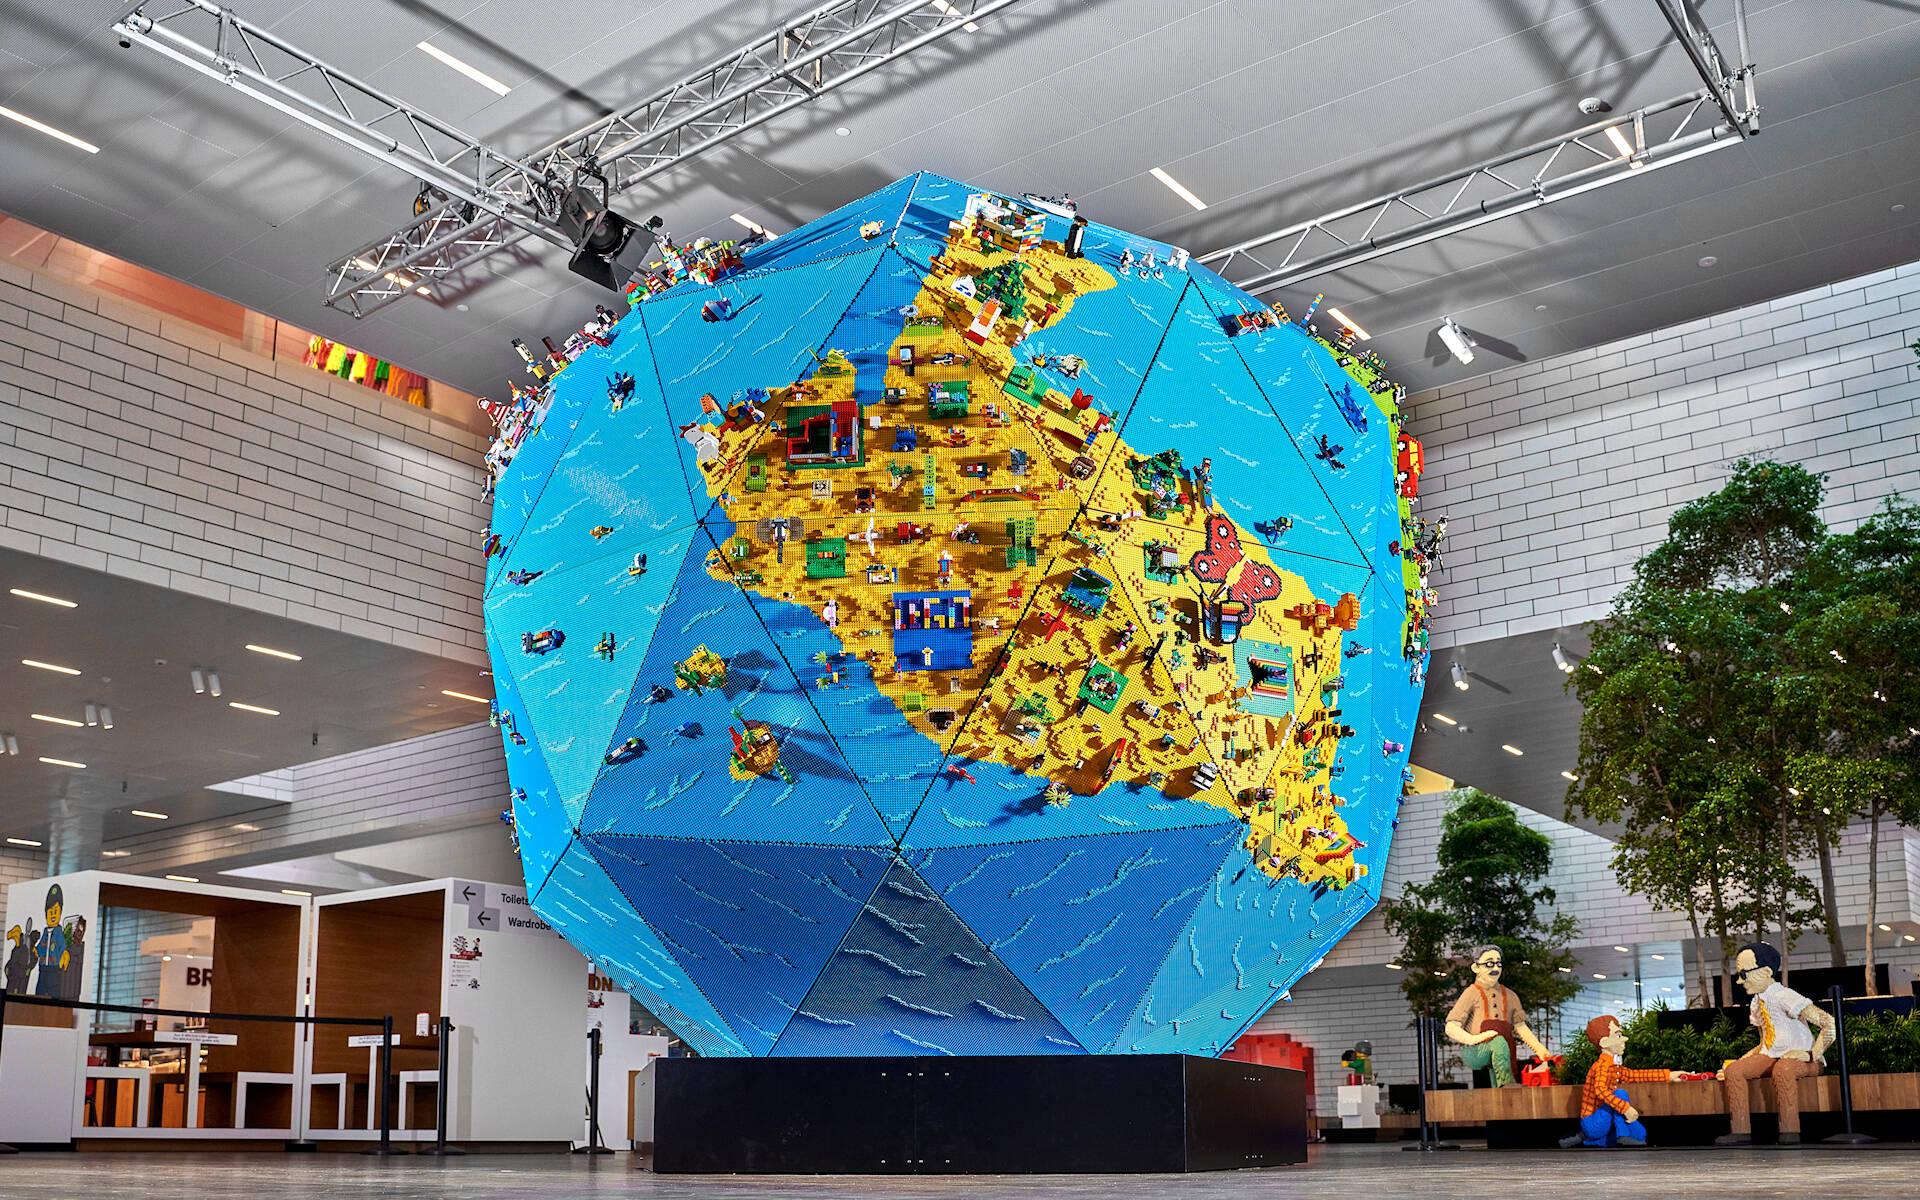 LEGO REBUILD THE WORLD